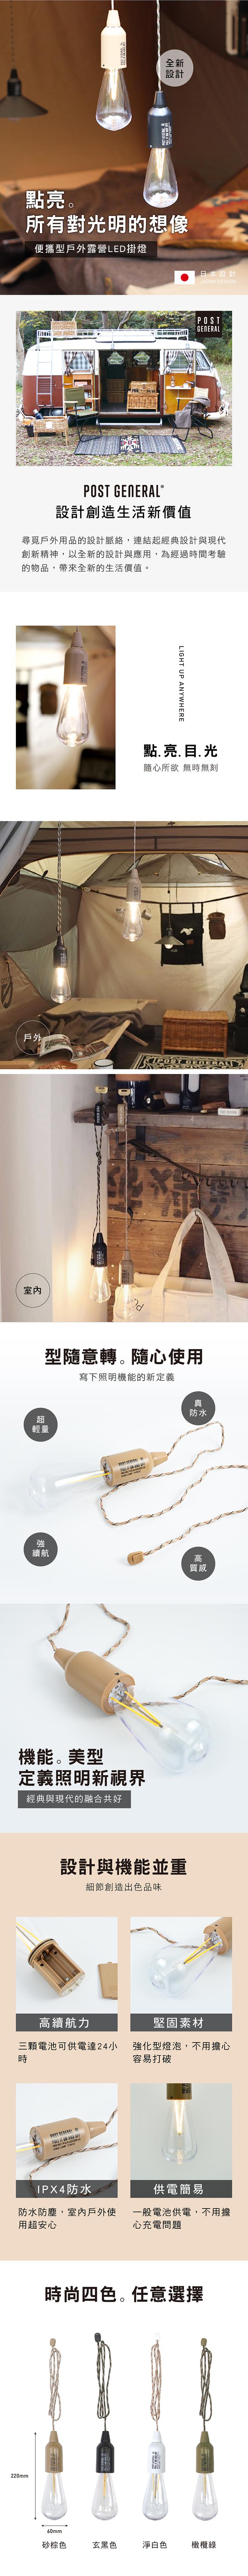 (複製)POST GENERAL–便攜型戶外露營LED掛燈(砂棕色)